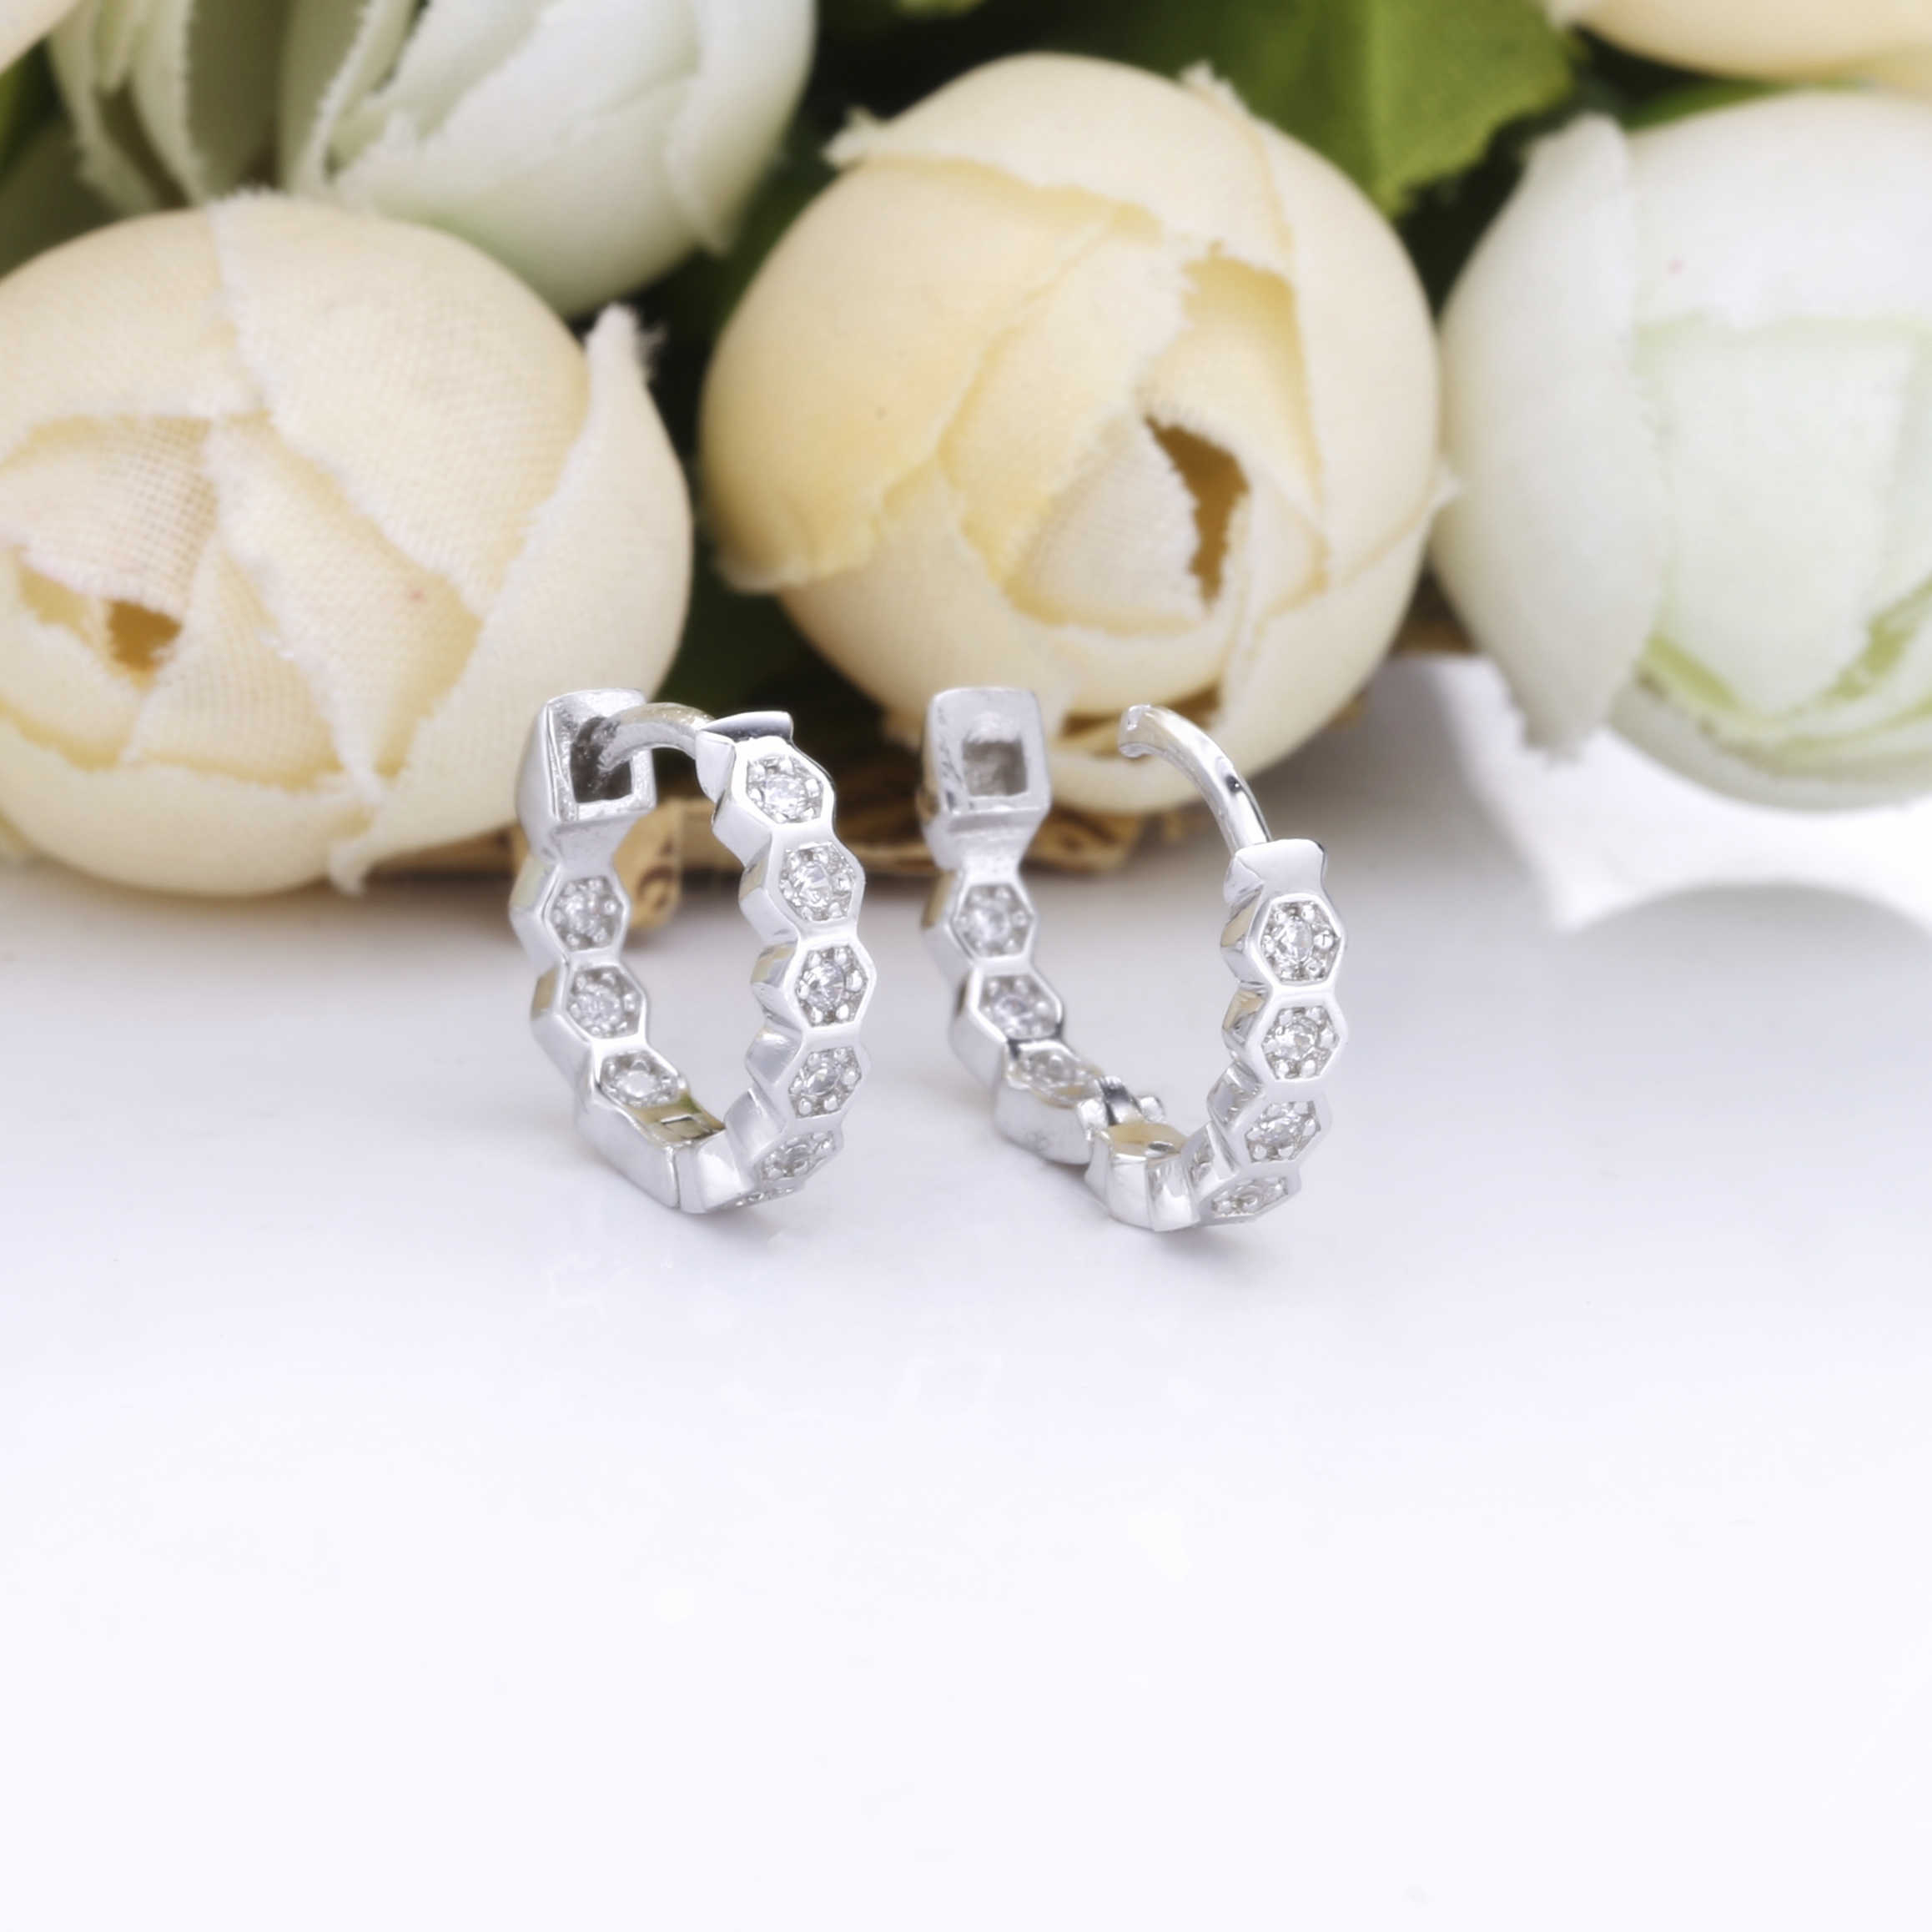 Slovecabin 925 Sterling Silver Baik Sarang Lebah Ring Huggies Kristal CZ Zircon Loop Lingkaran Fashion Wanita Pertunangan Perhiasan Hadiah